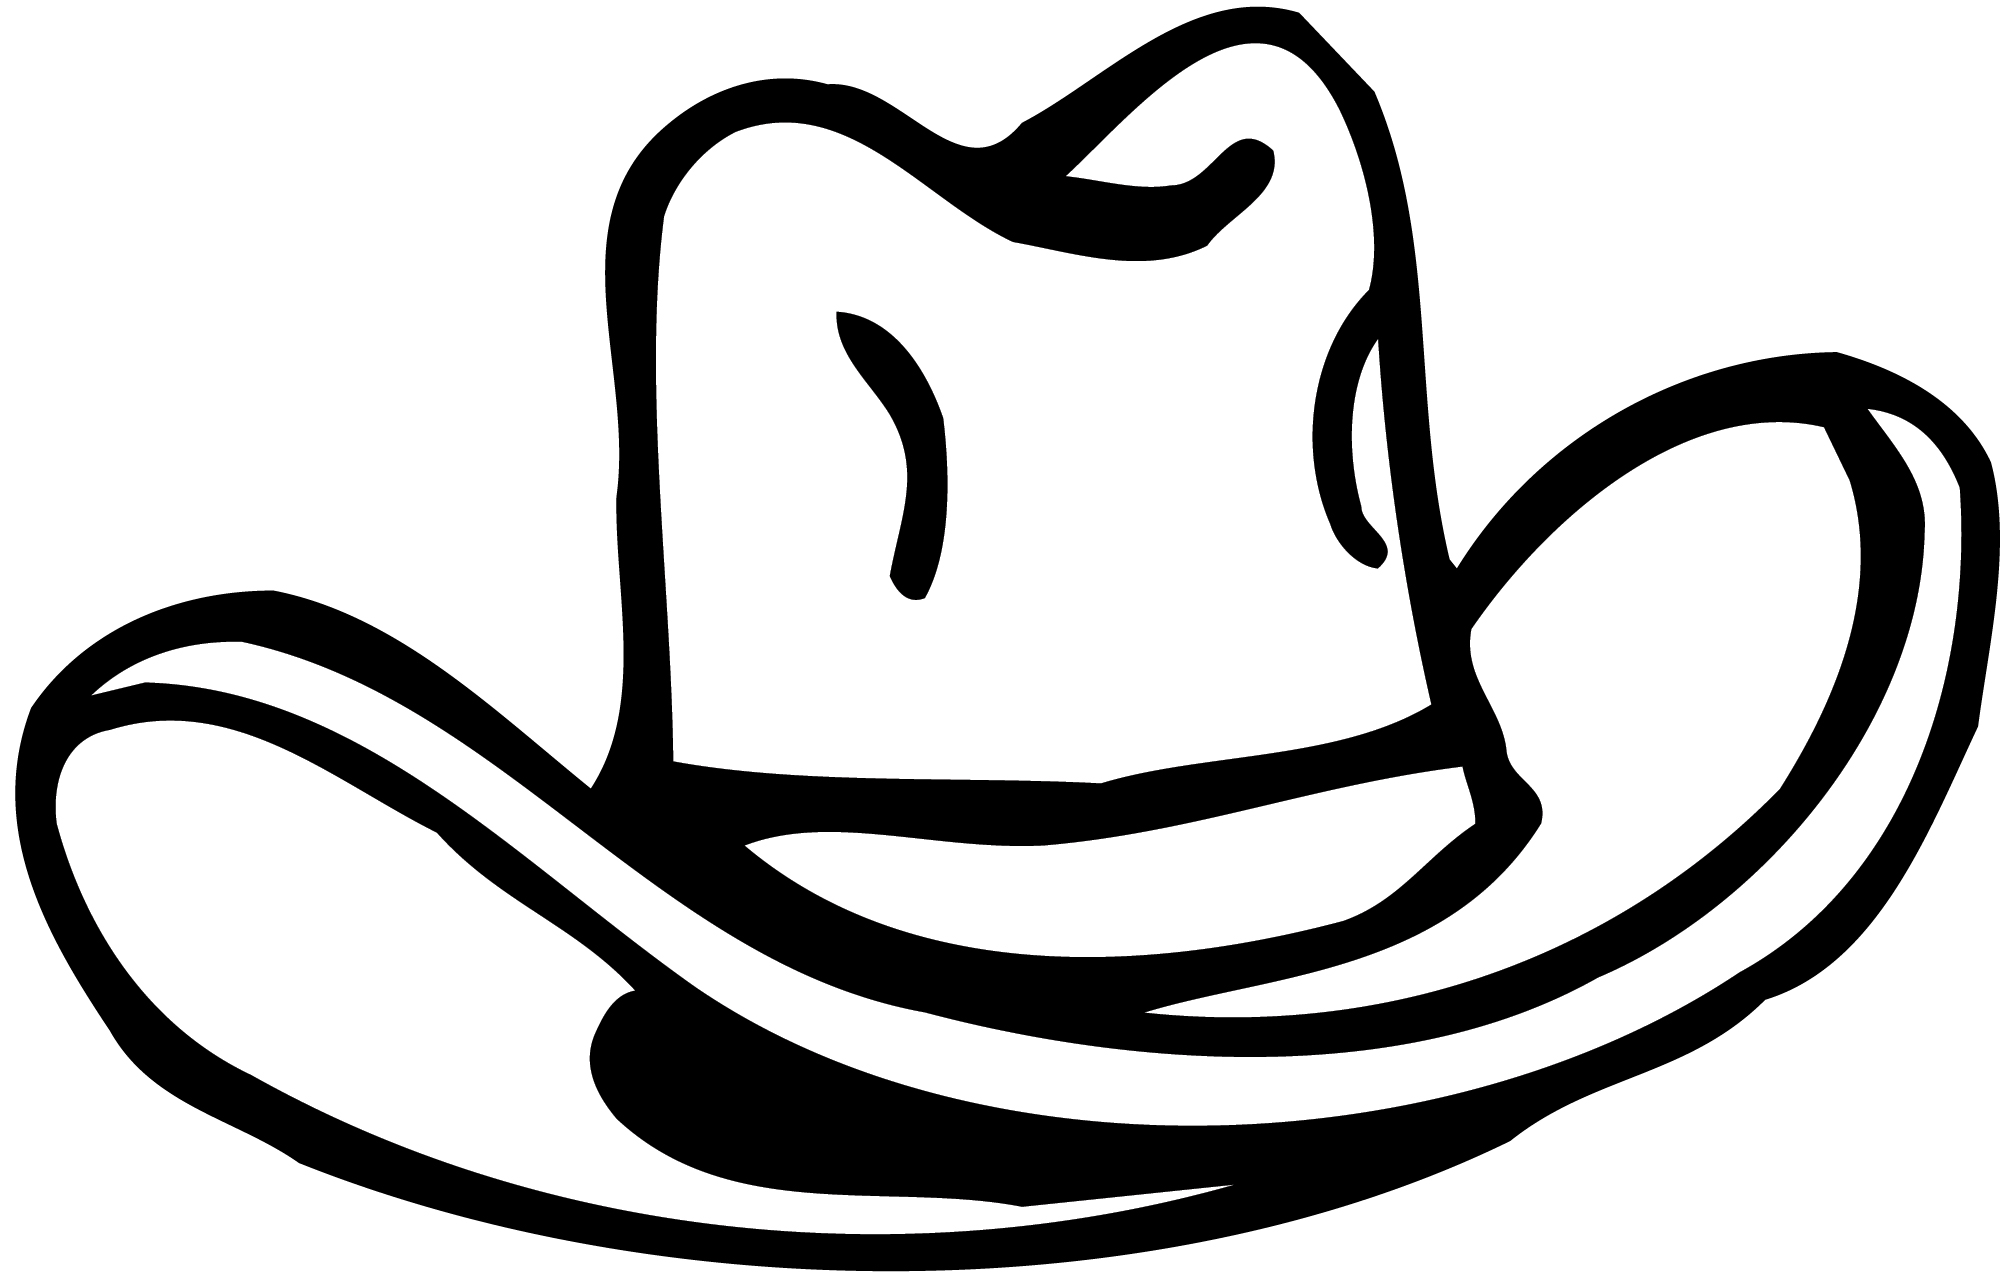 hight resolution of cowboy hat wboy hat clipart 2